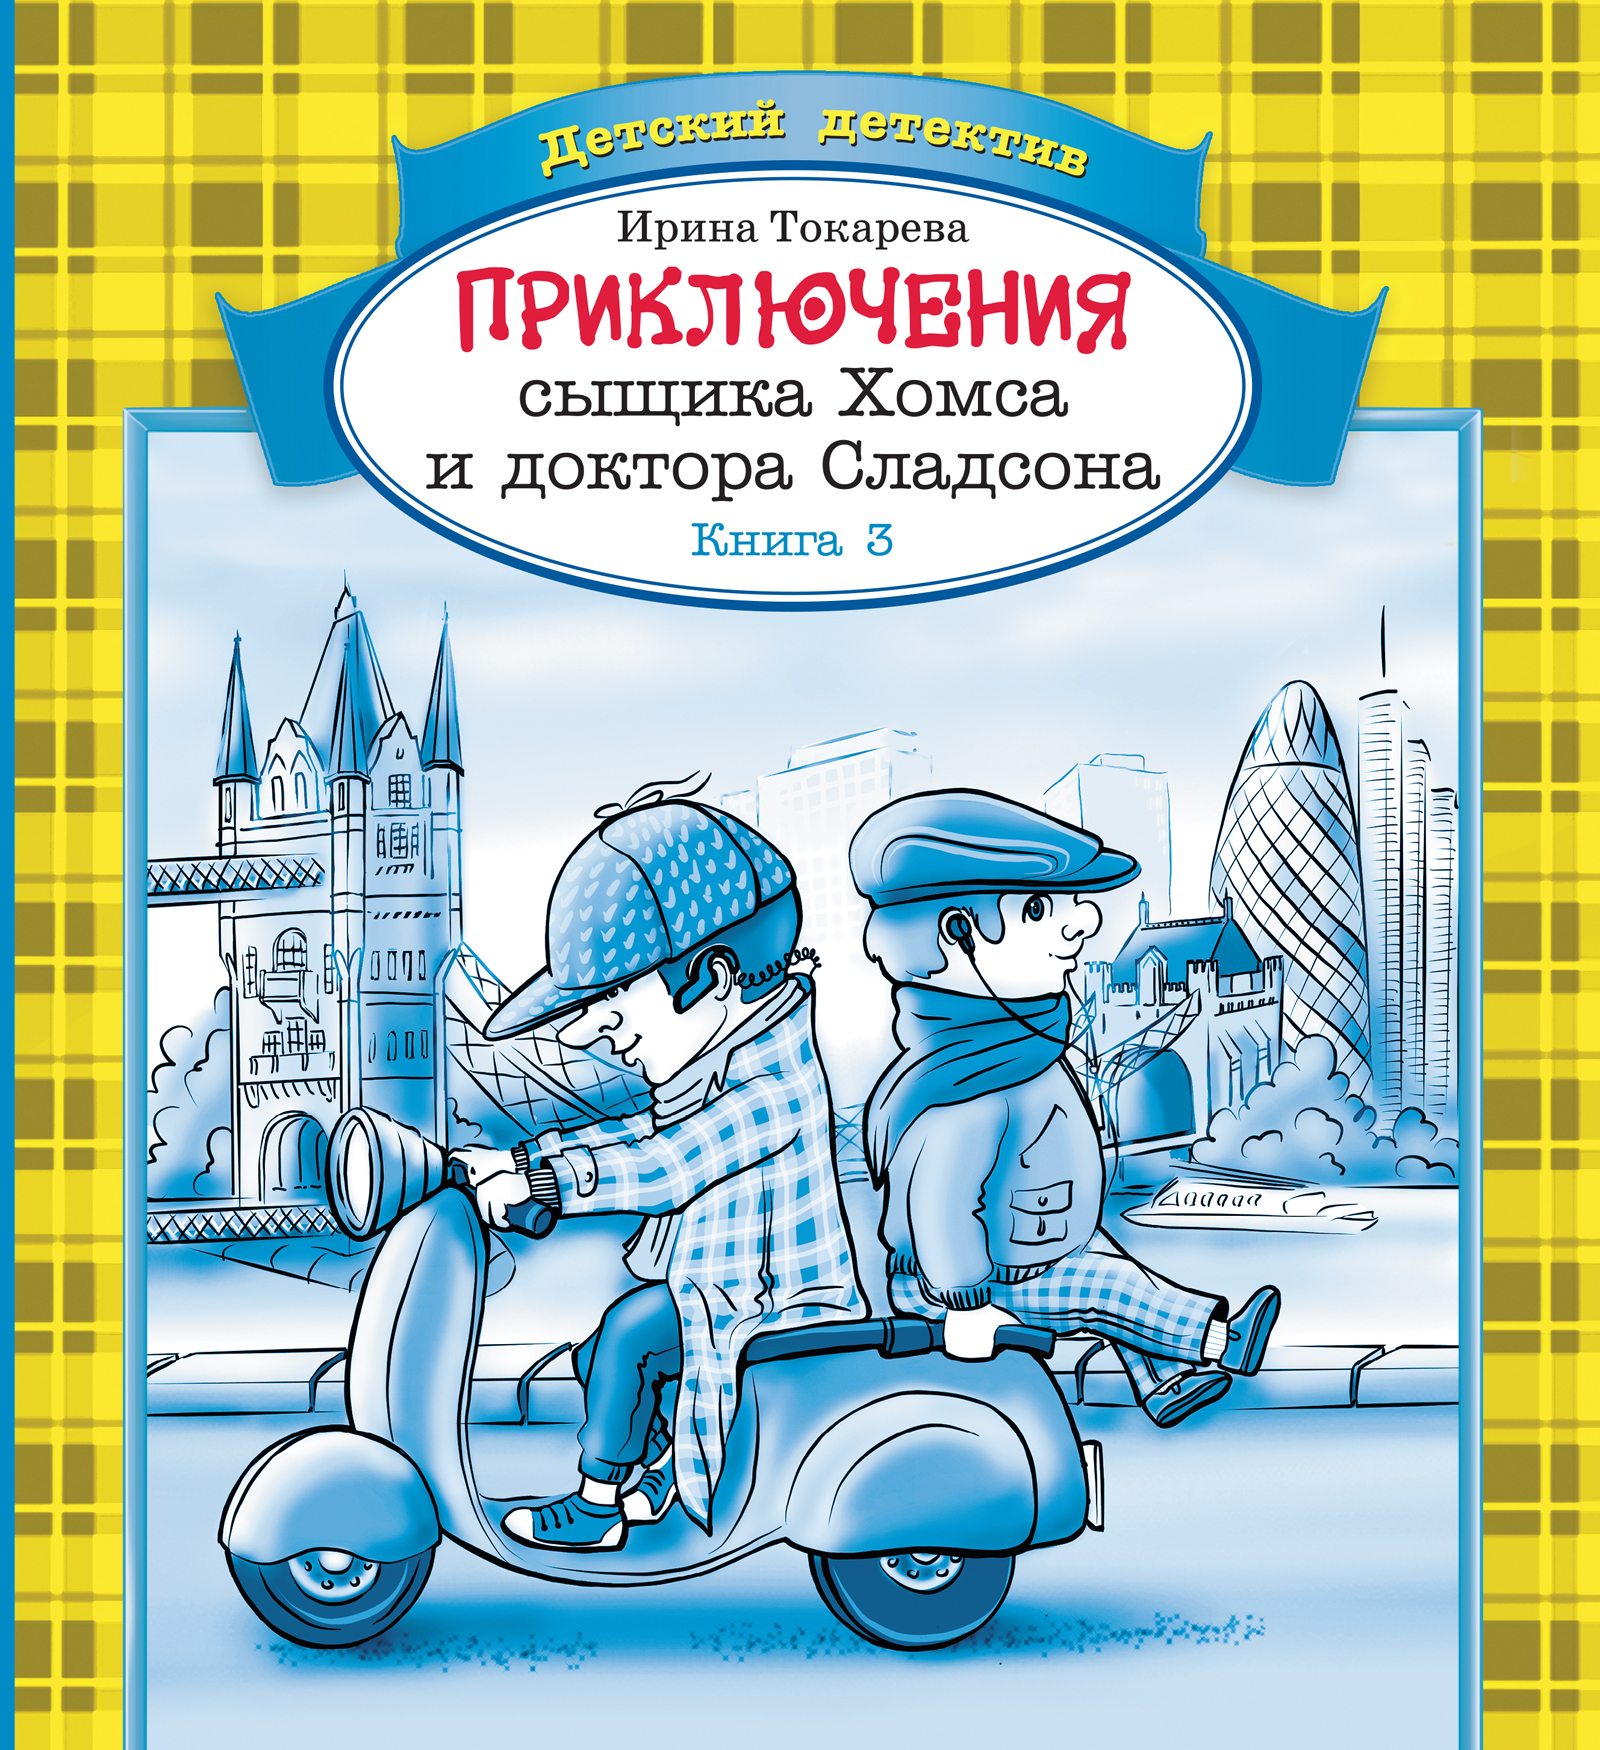 Приключения сыщика Хомса и доктора Сладсона.  Книга 3